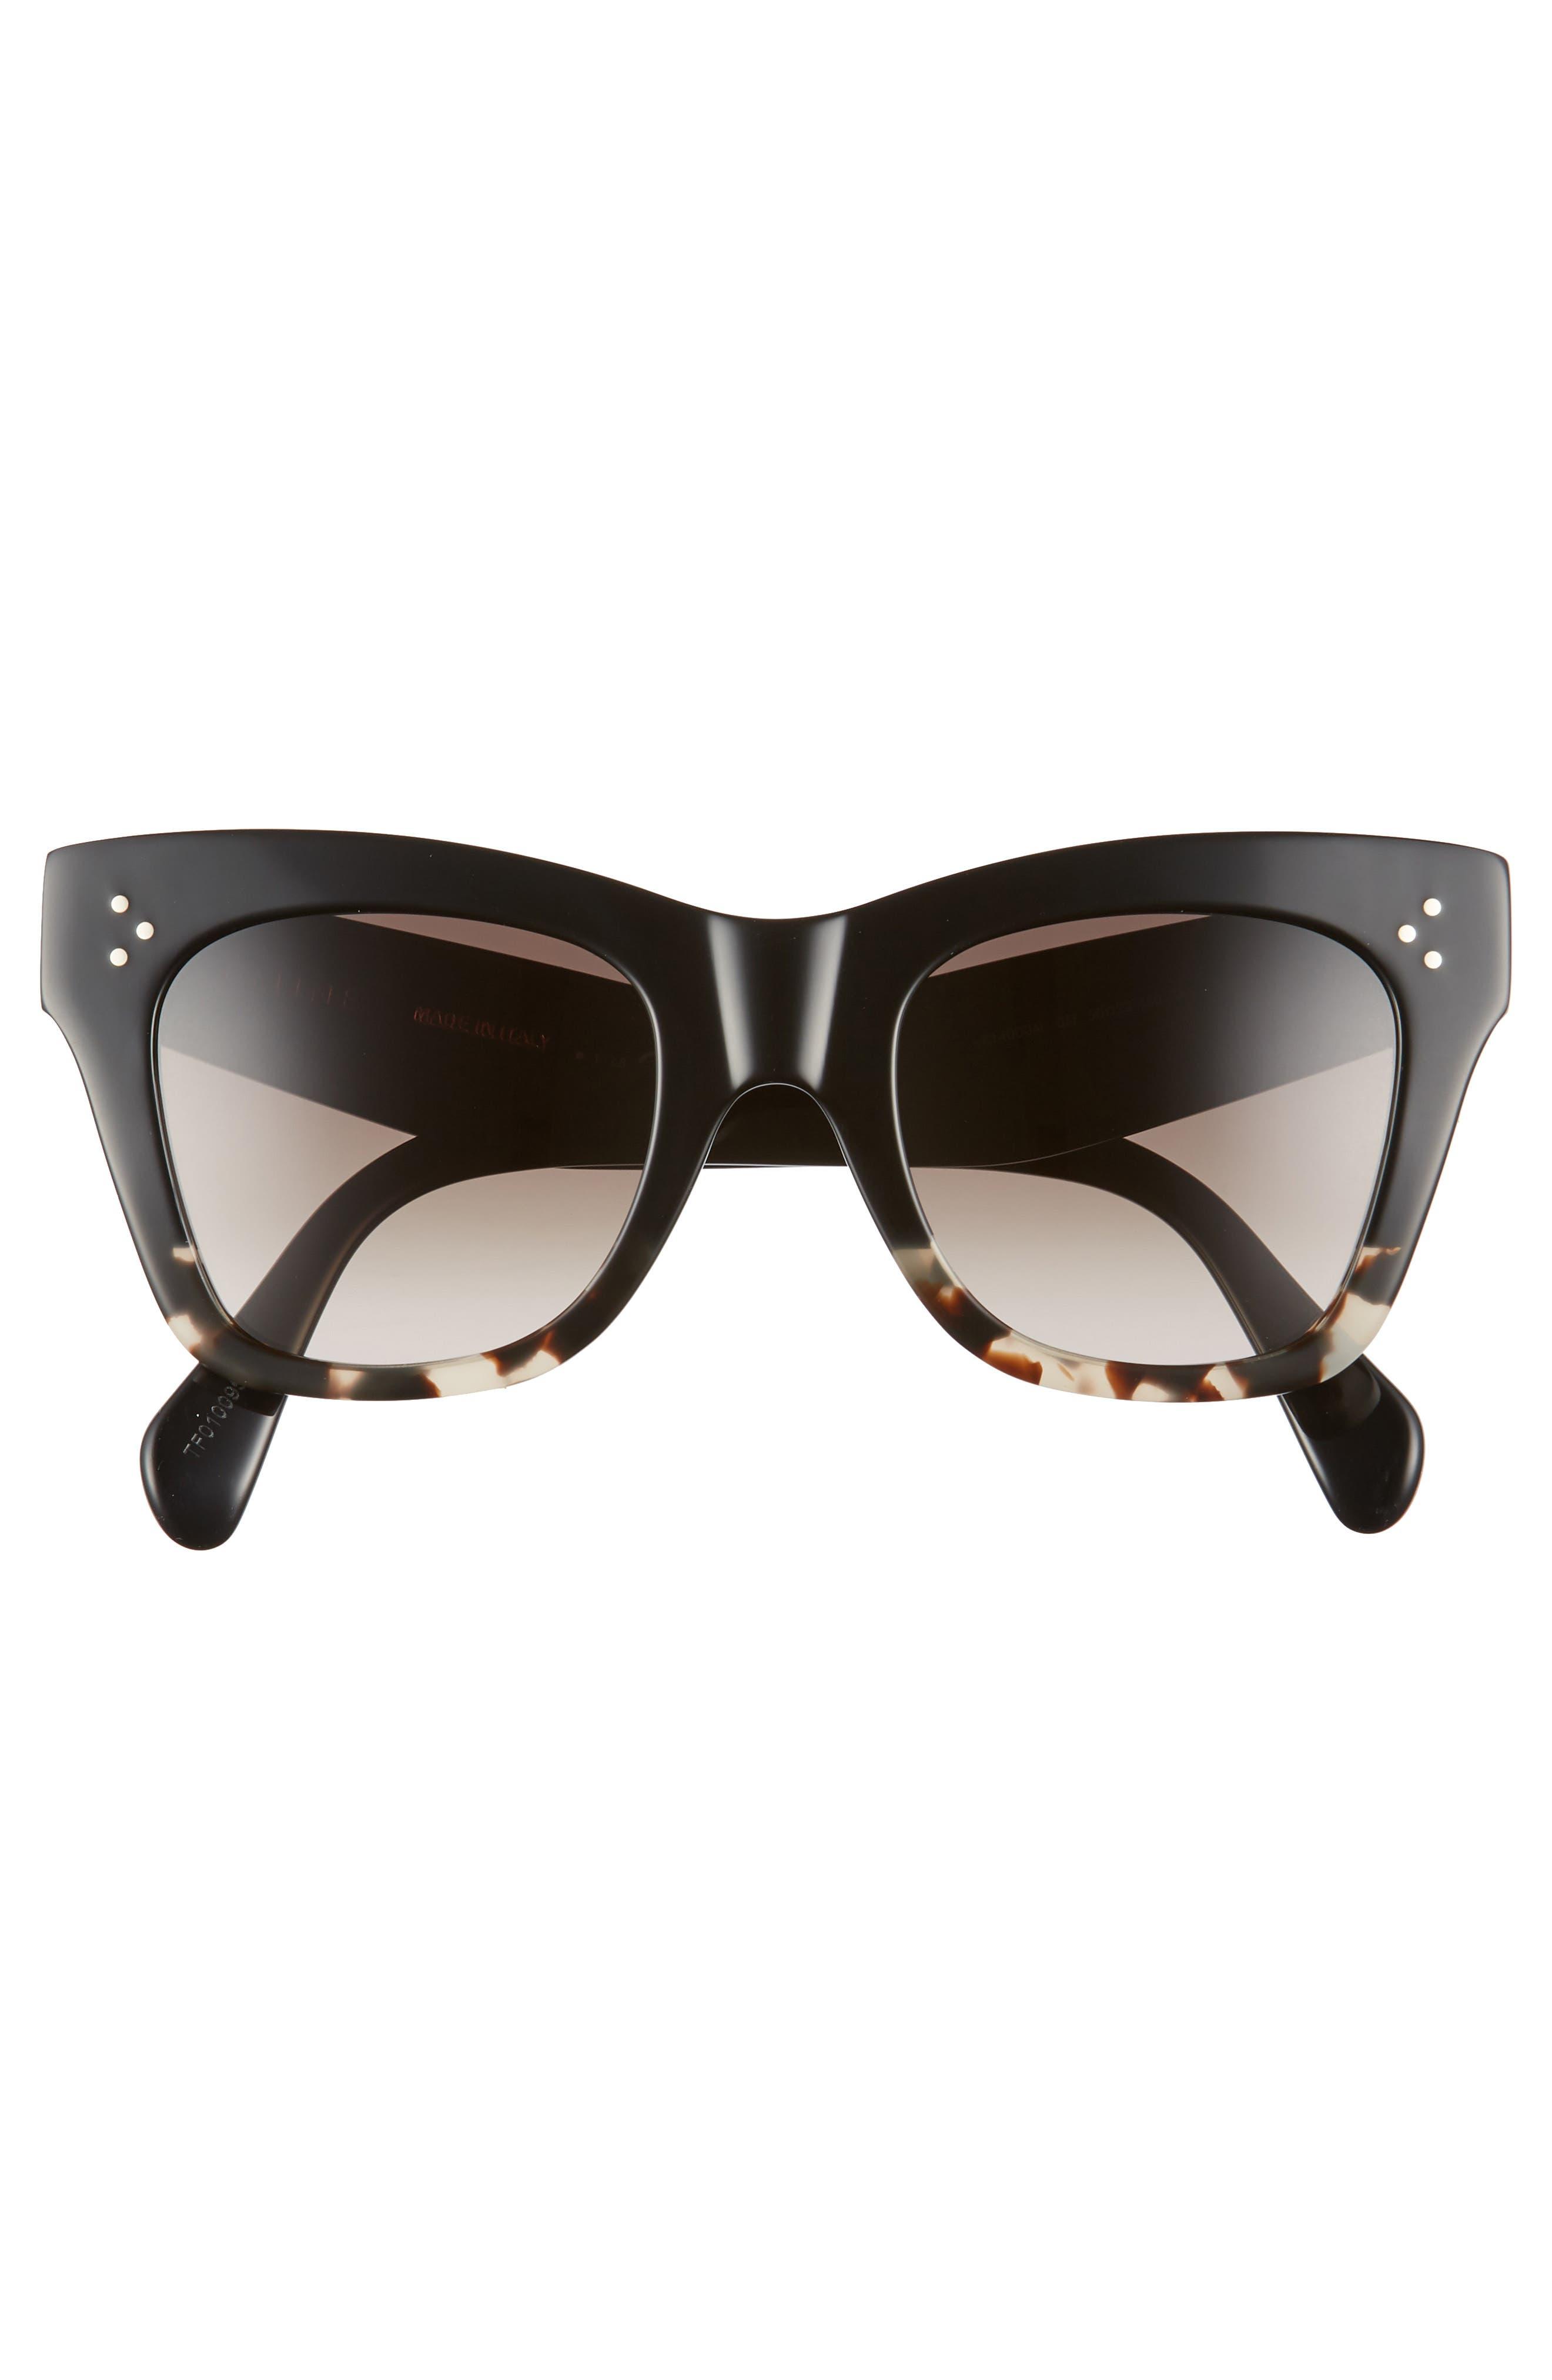 CELINE, 50mm Gradient Butterfly Sunglasses, Alternate thumbnail 4, color, BLACK/ GREY HAVANA/ BROWN